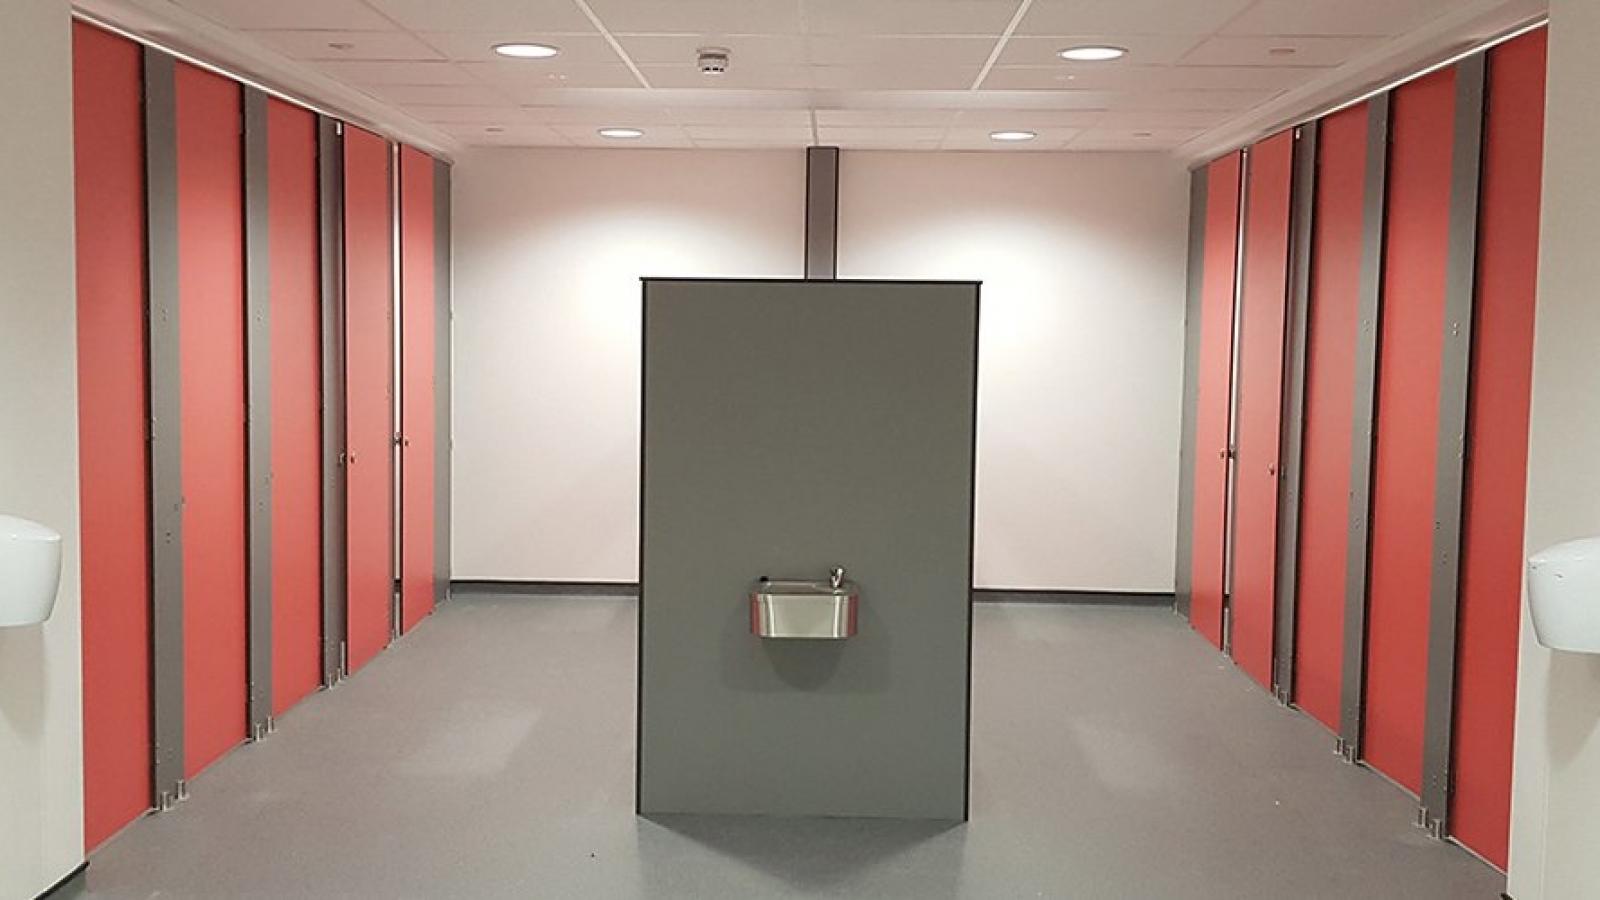 Covid-19 Public Washroom Redesign